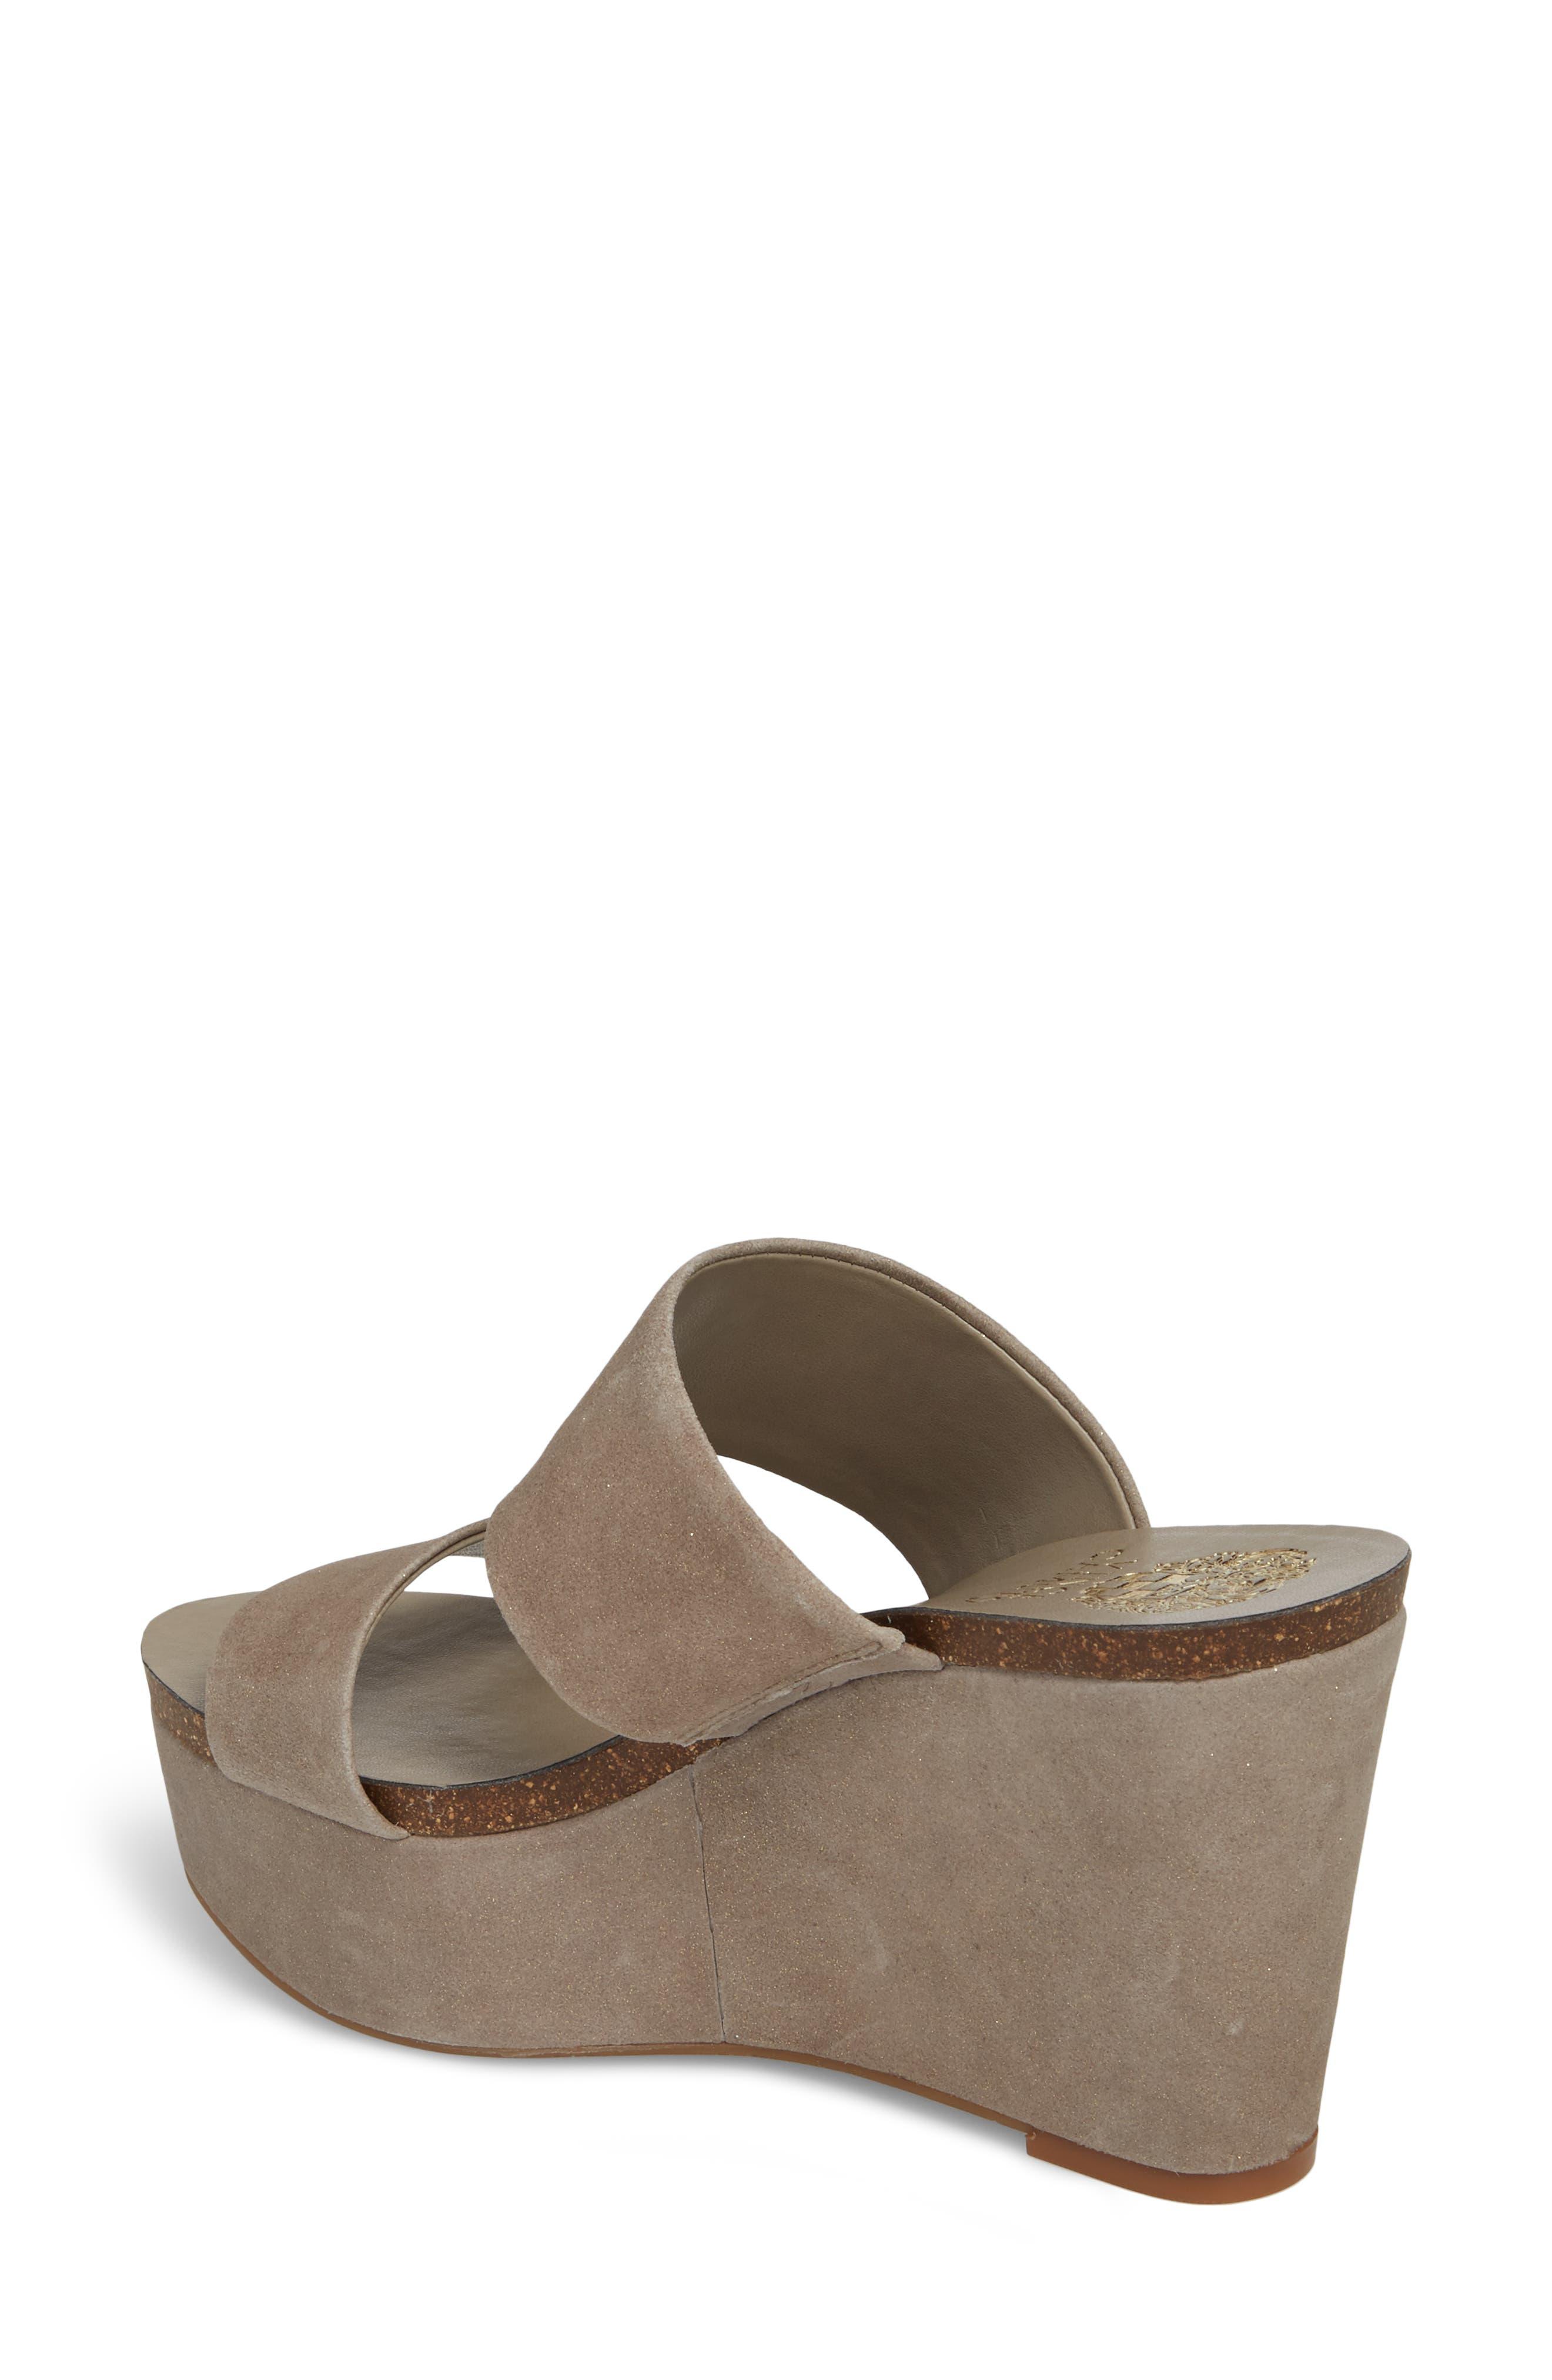 Varenia Platform Wedge Sandal,                             Alternate thumbnail 2, color,                             SILVER GREY FABRIC